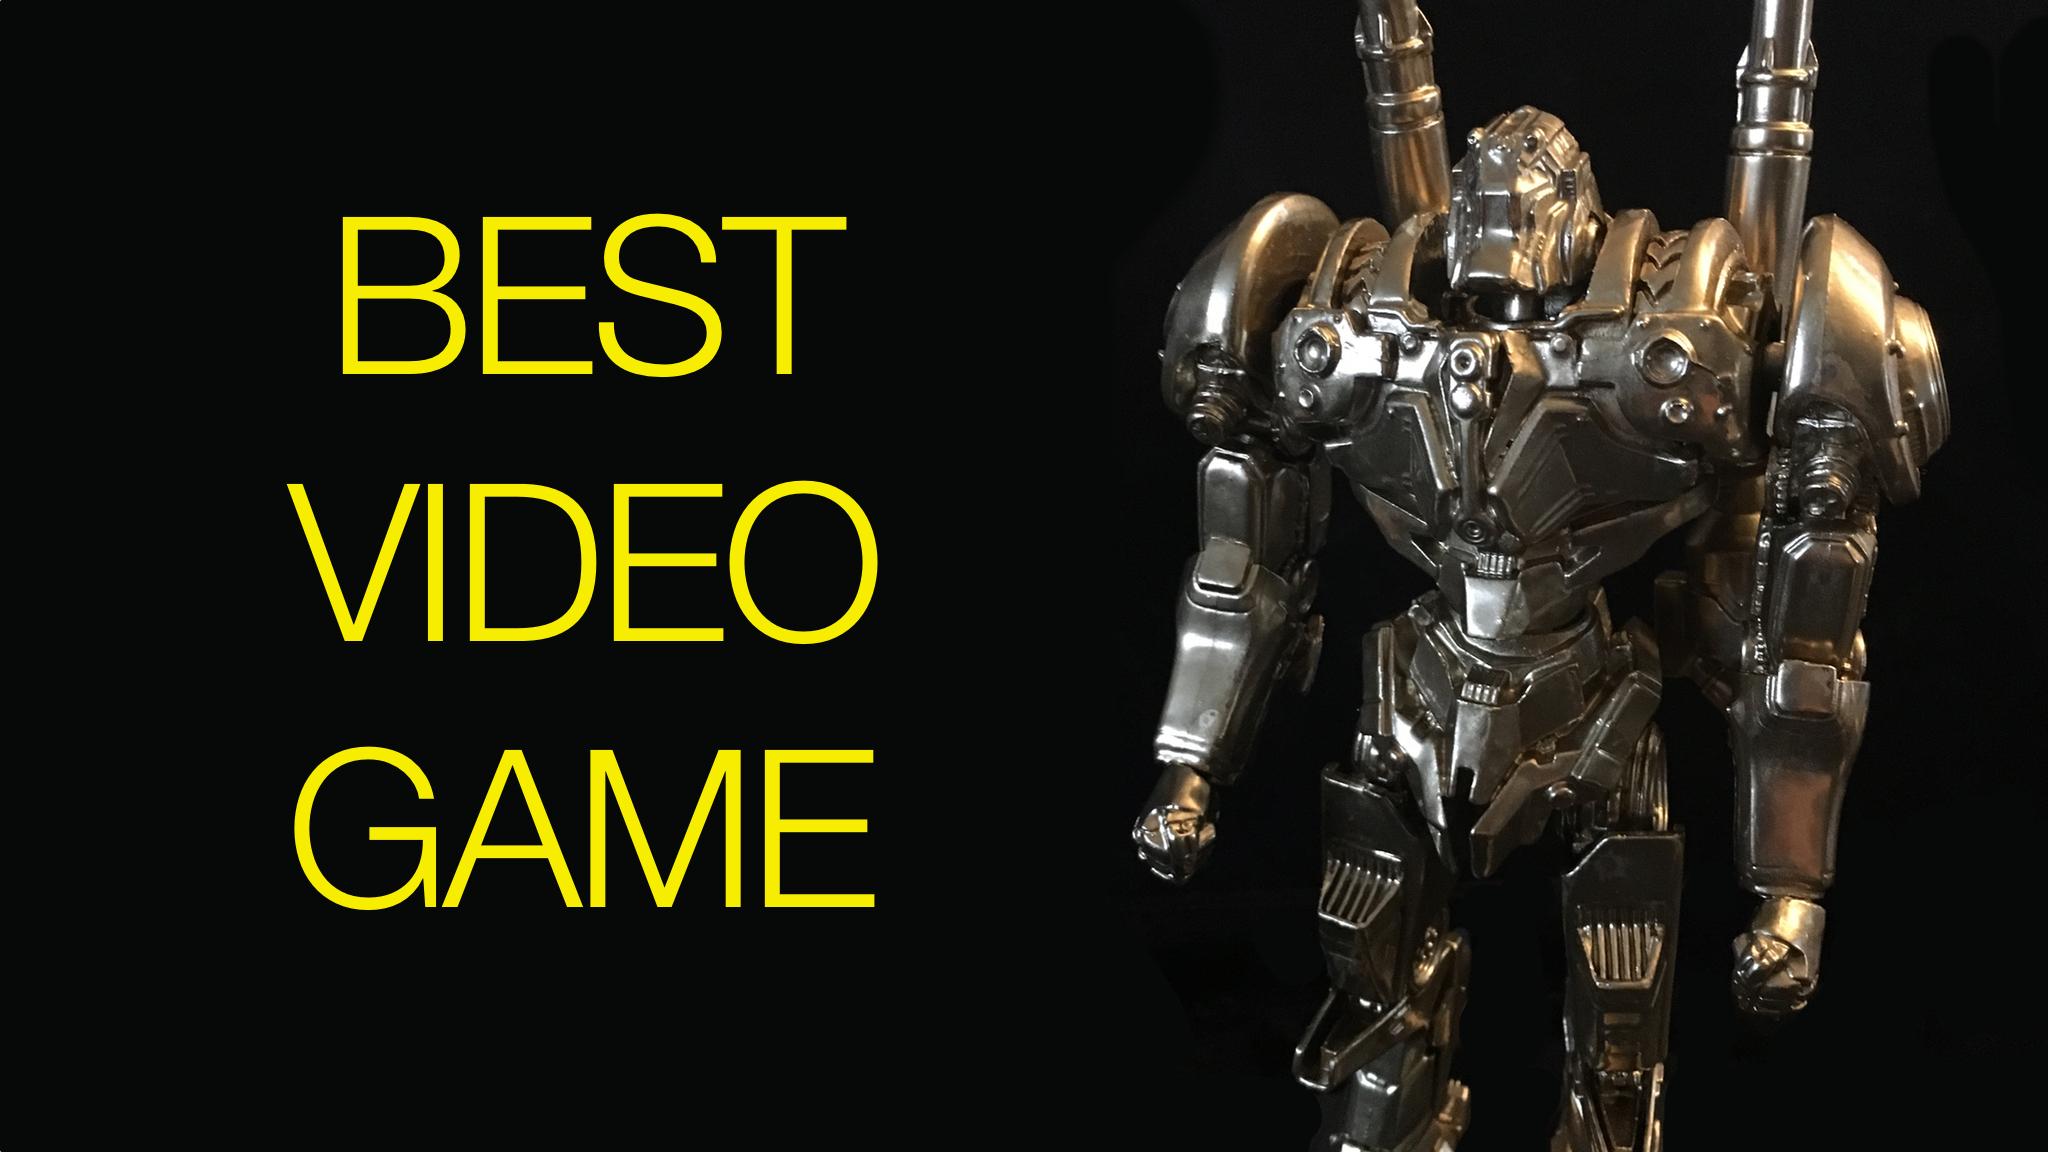 BEST VIDEO GAME 2048X1152.jpg